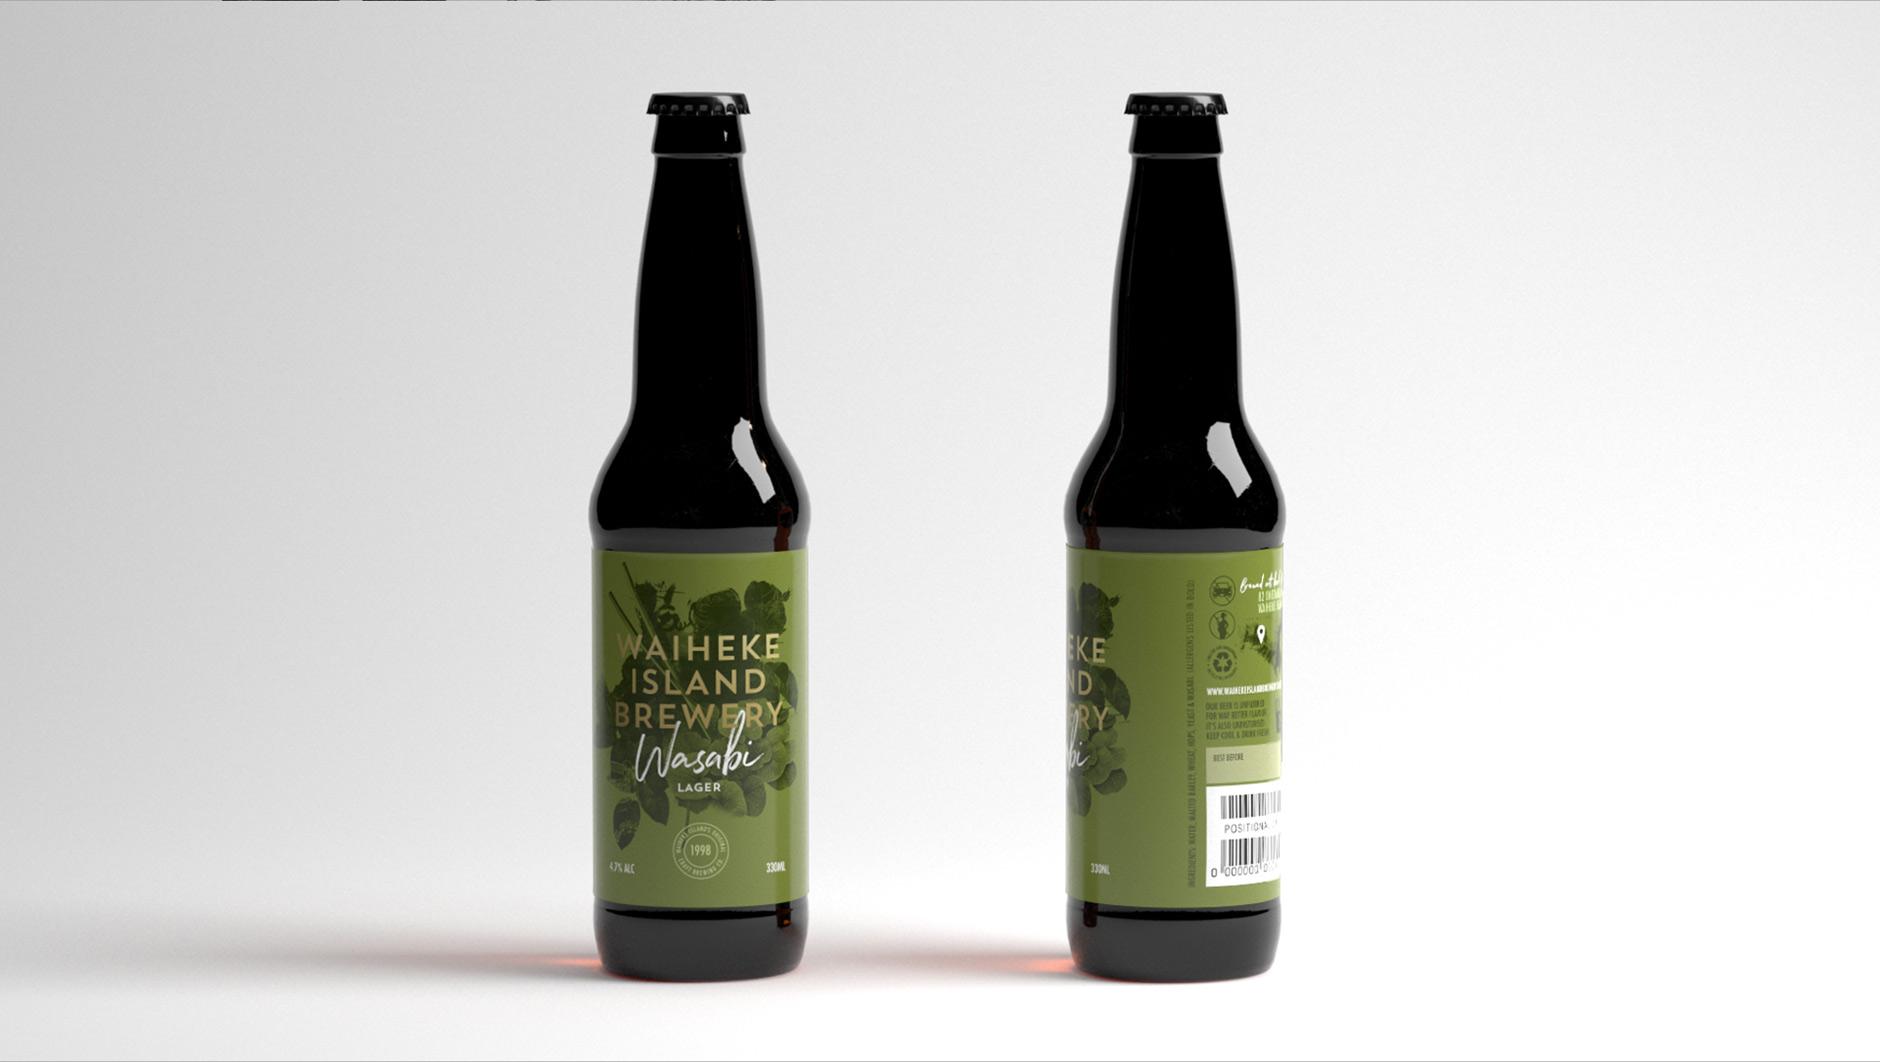 Waiheke Island Brewery Wasabi Lager bottle